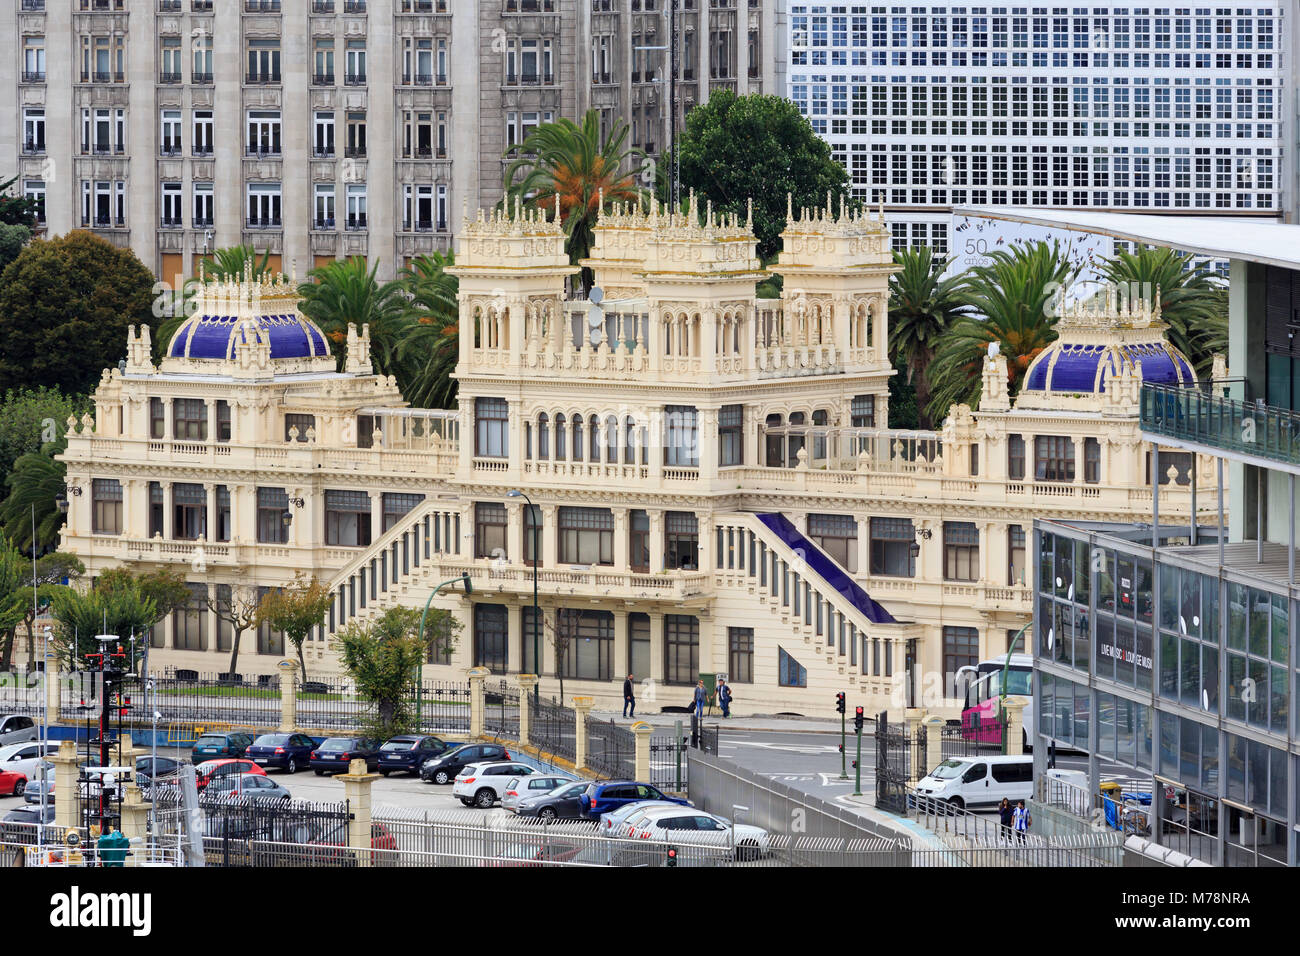 Terraza Building, La Coruna City, Galicia, Spain, Europe - Stock Image